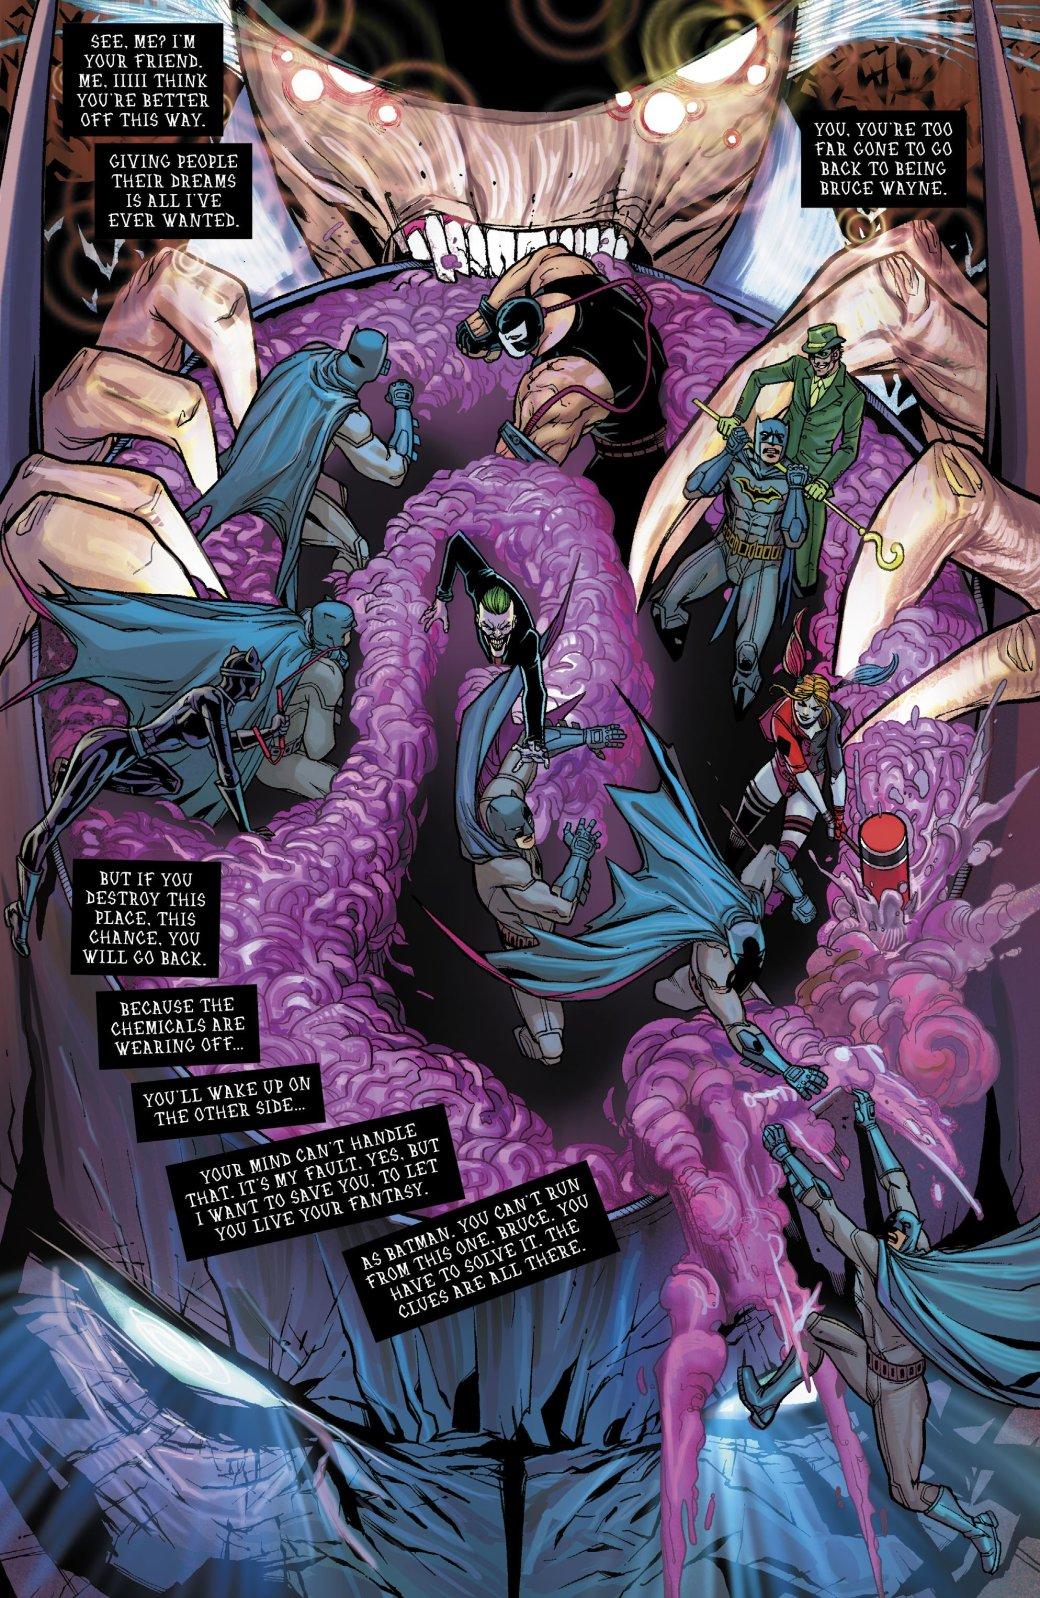 Бэтмен против Безумного Шляпника - Изображение 3